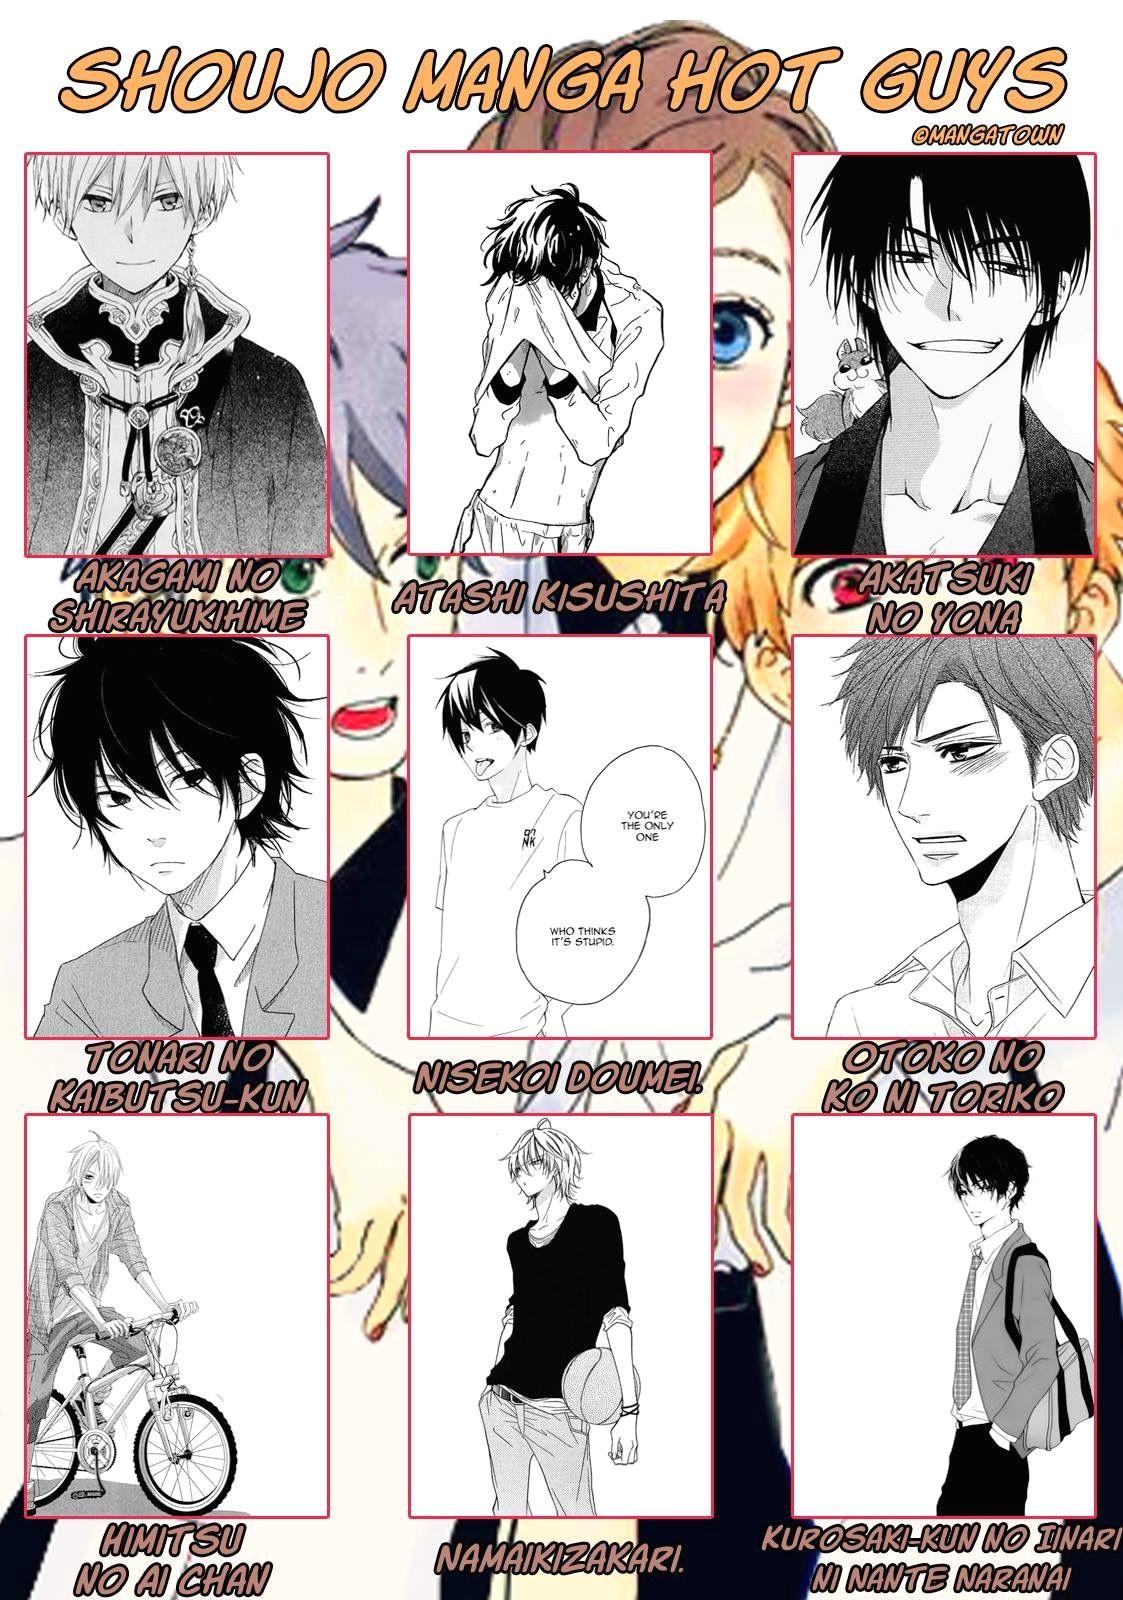 manga to read shoujo manga hot guys